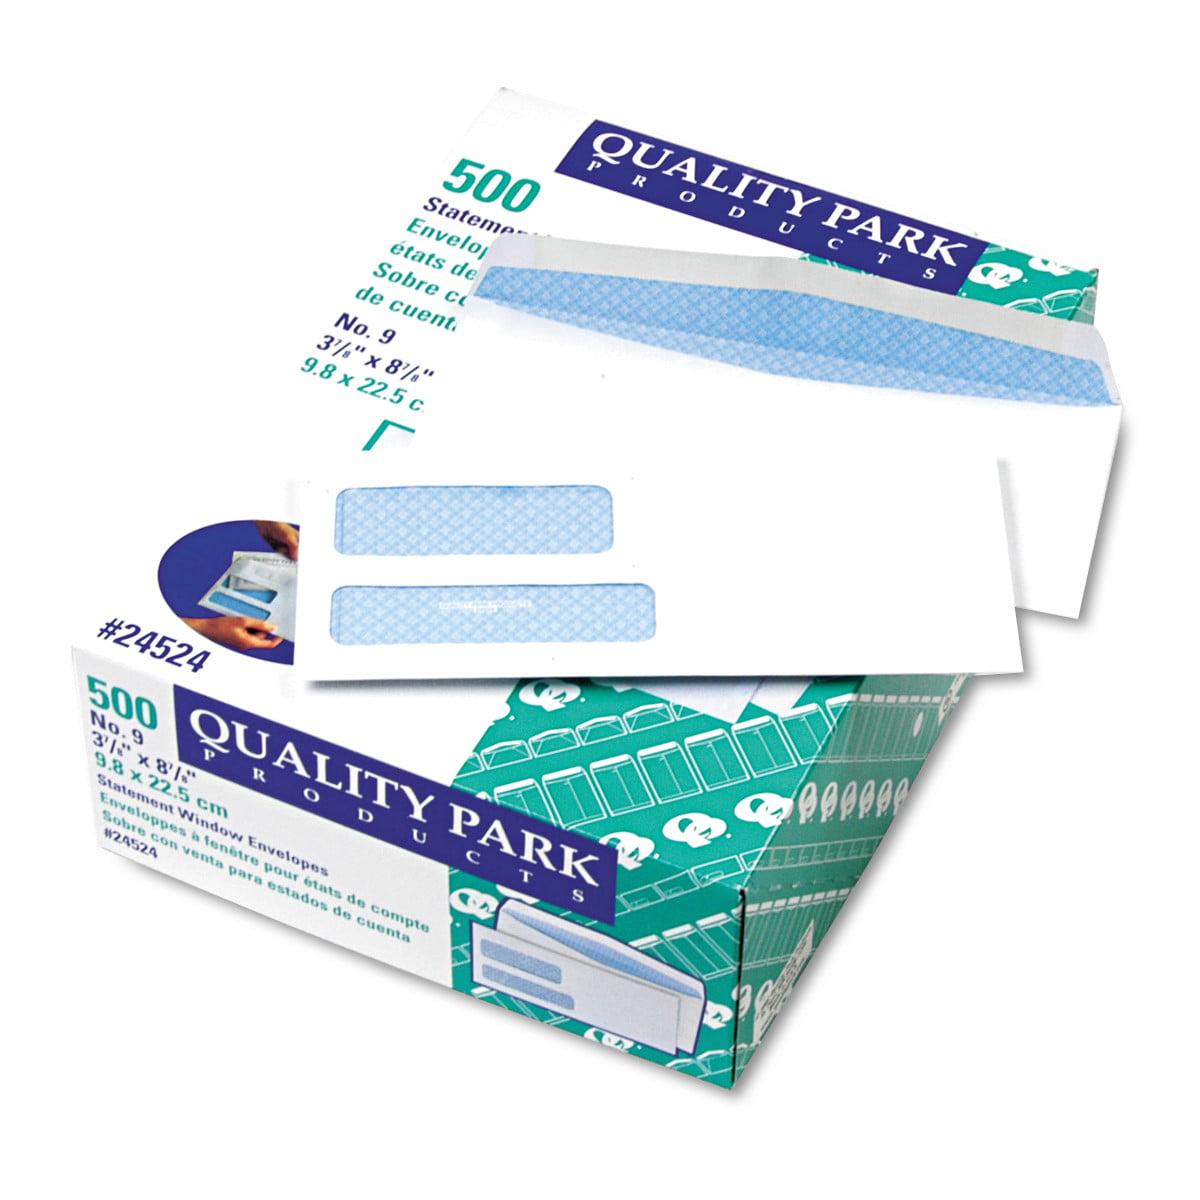 Quality Park 2-Window Security Tinted Invoice/Check Mailer, #9, 3 7/8 x 8 7/8, White, 500/BX -QUA24524